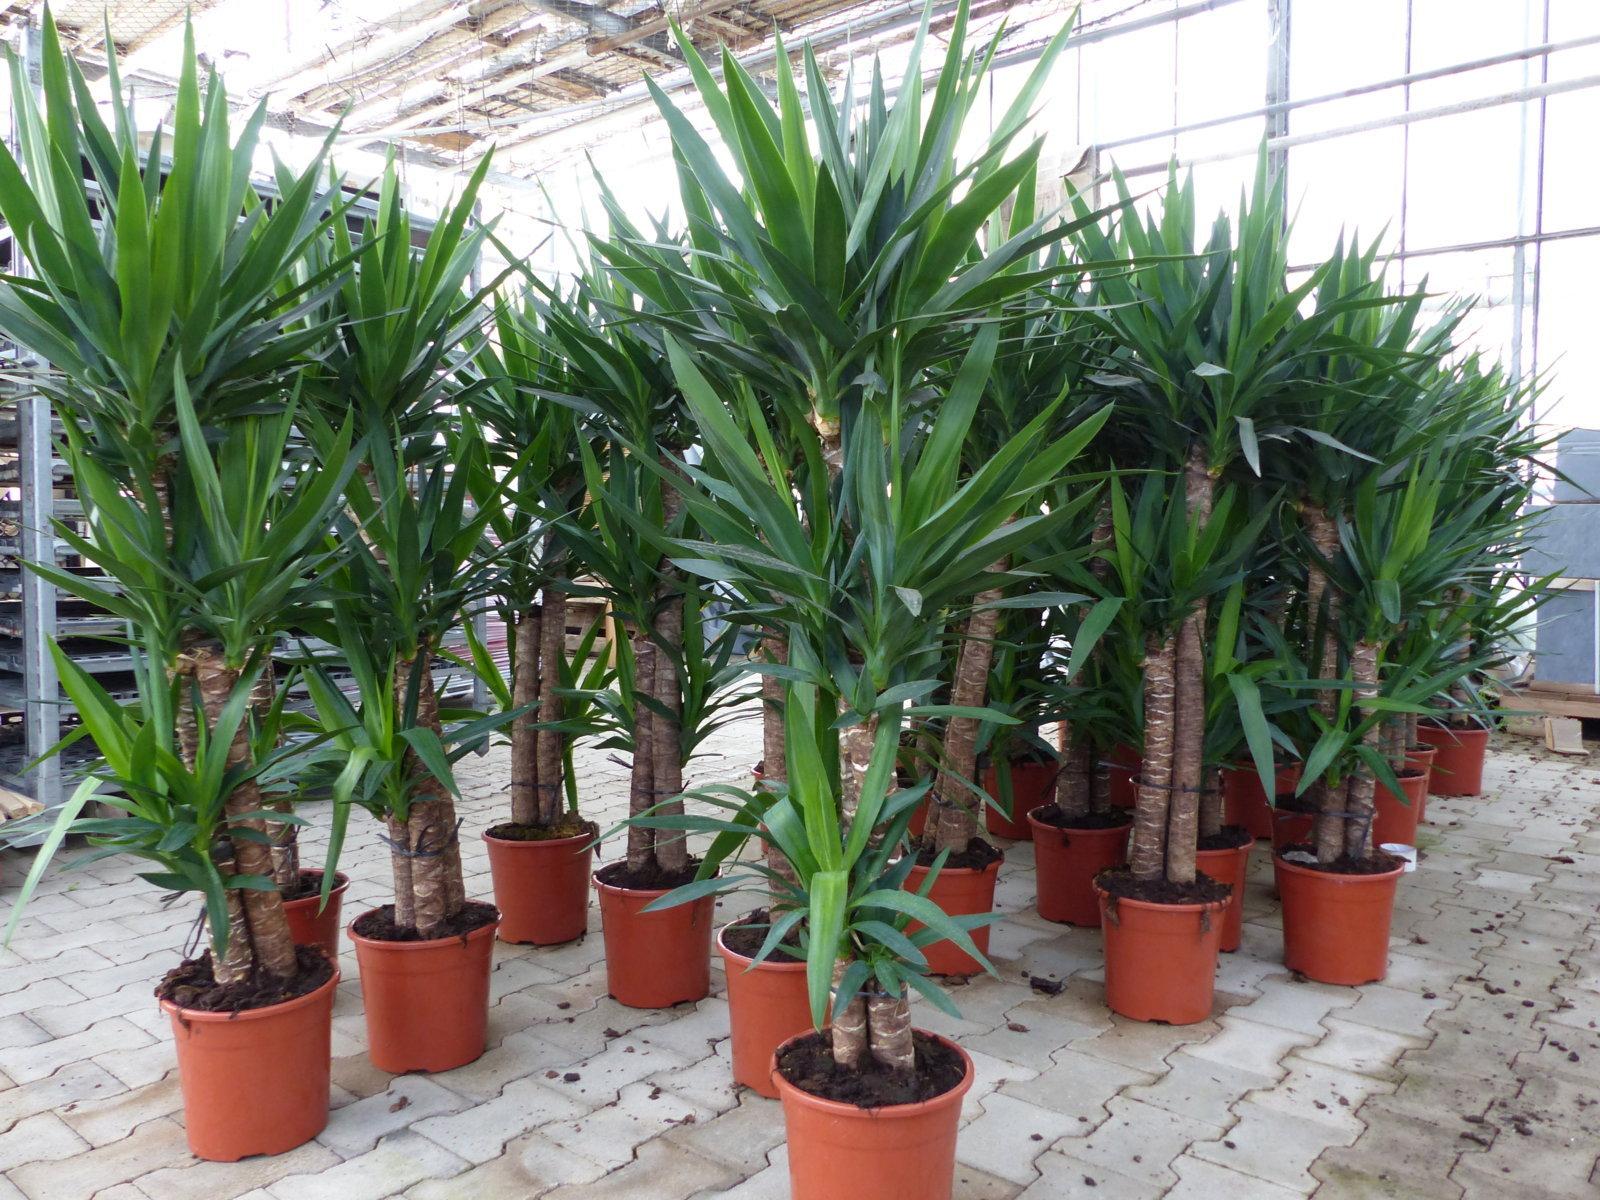 3 k pfe yucca palme elephantipes 160 cm hoch b ropflanze for Zimmer yucca palme bluht